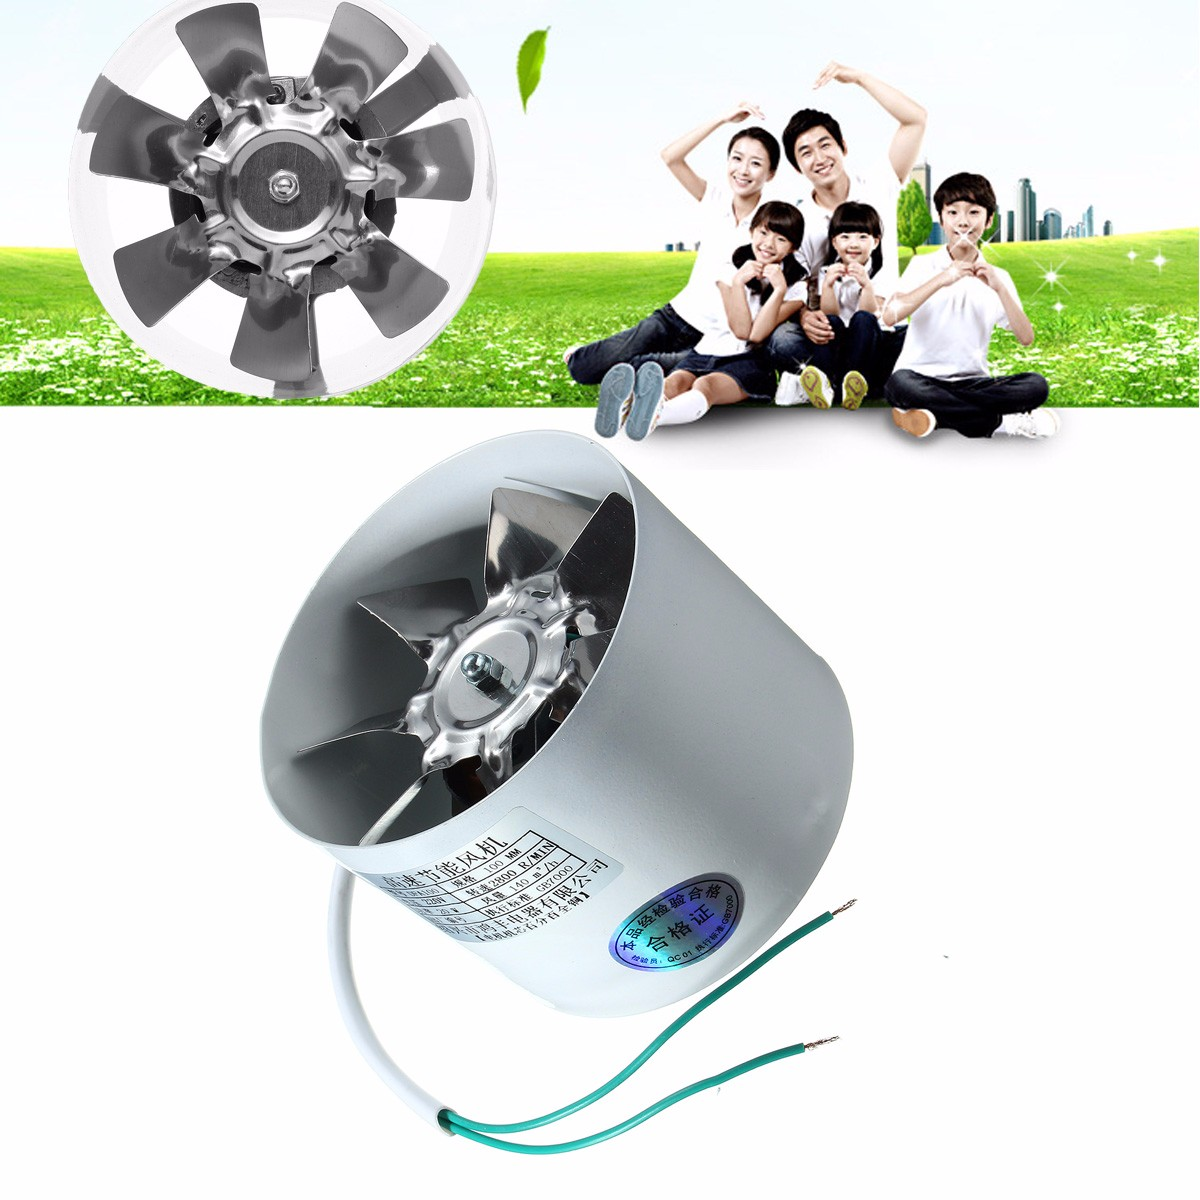 6 Duct Booster Fans Quiet : Quot inline ducting fan booster exhau end  am